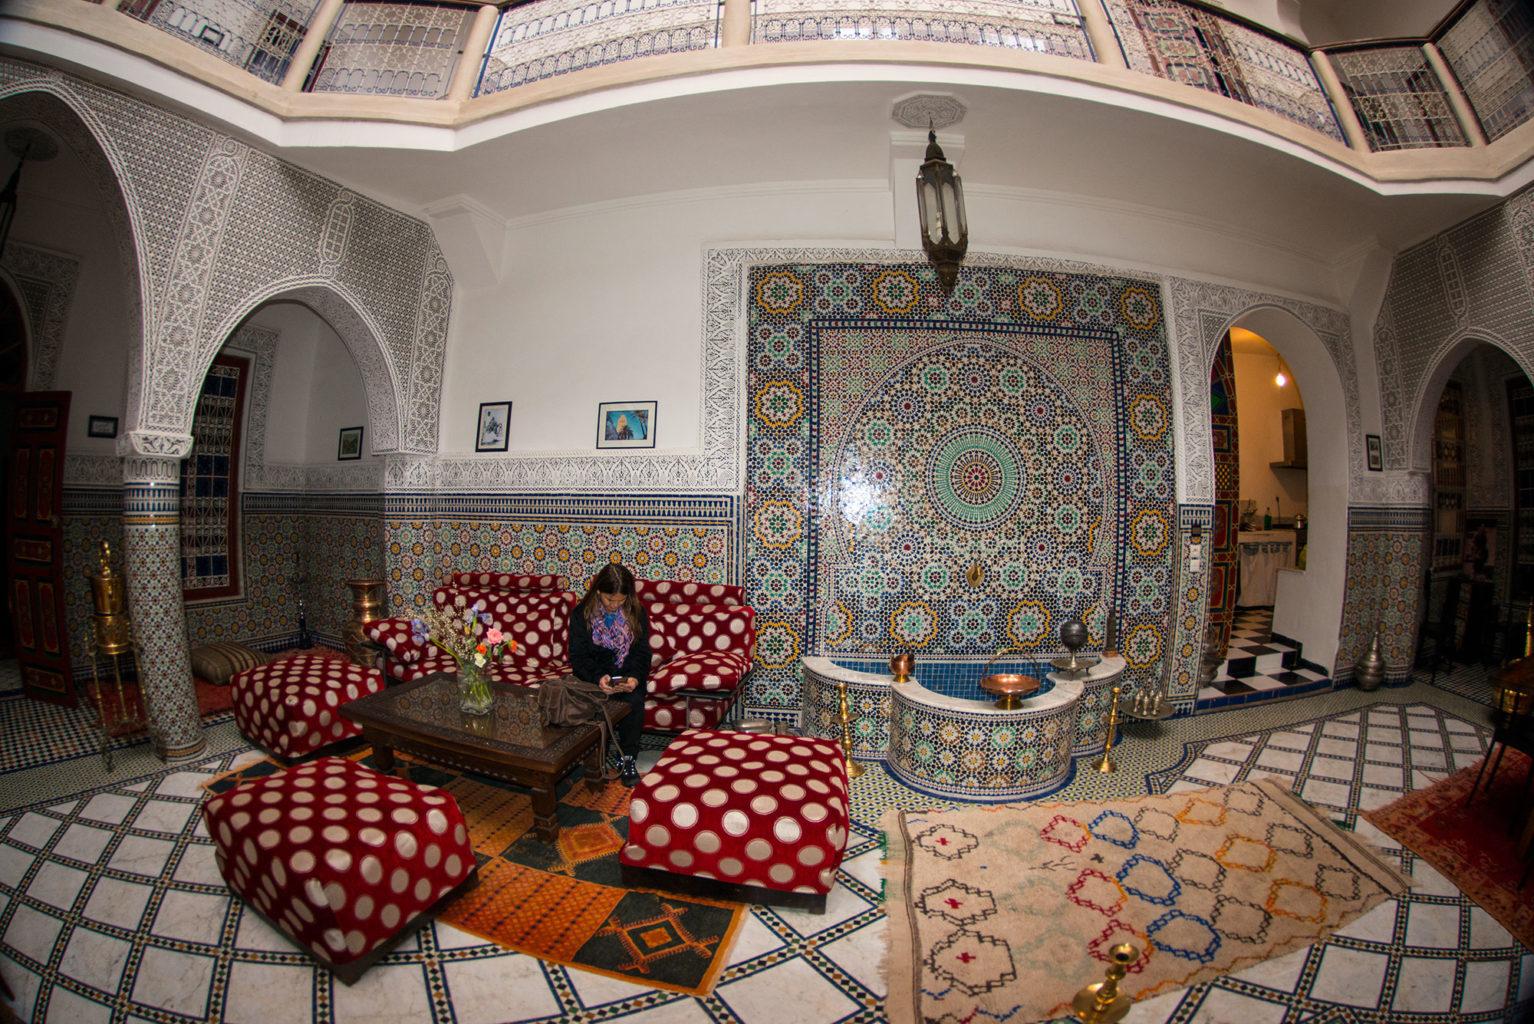 Riad Almoulouk in Marrakech Morocco